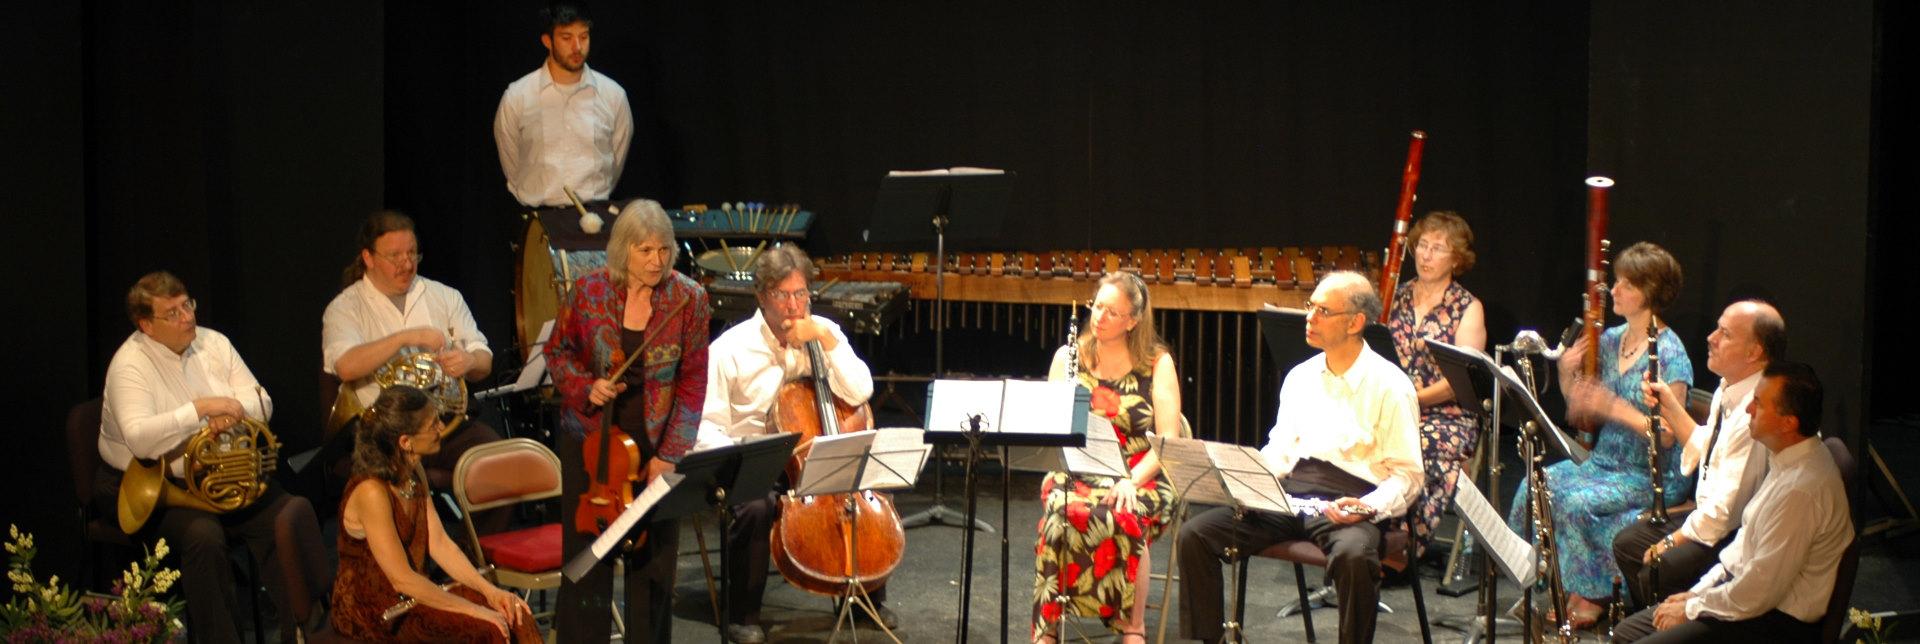 SLLMF Musicians performing at Deertree